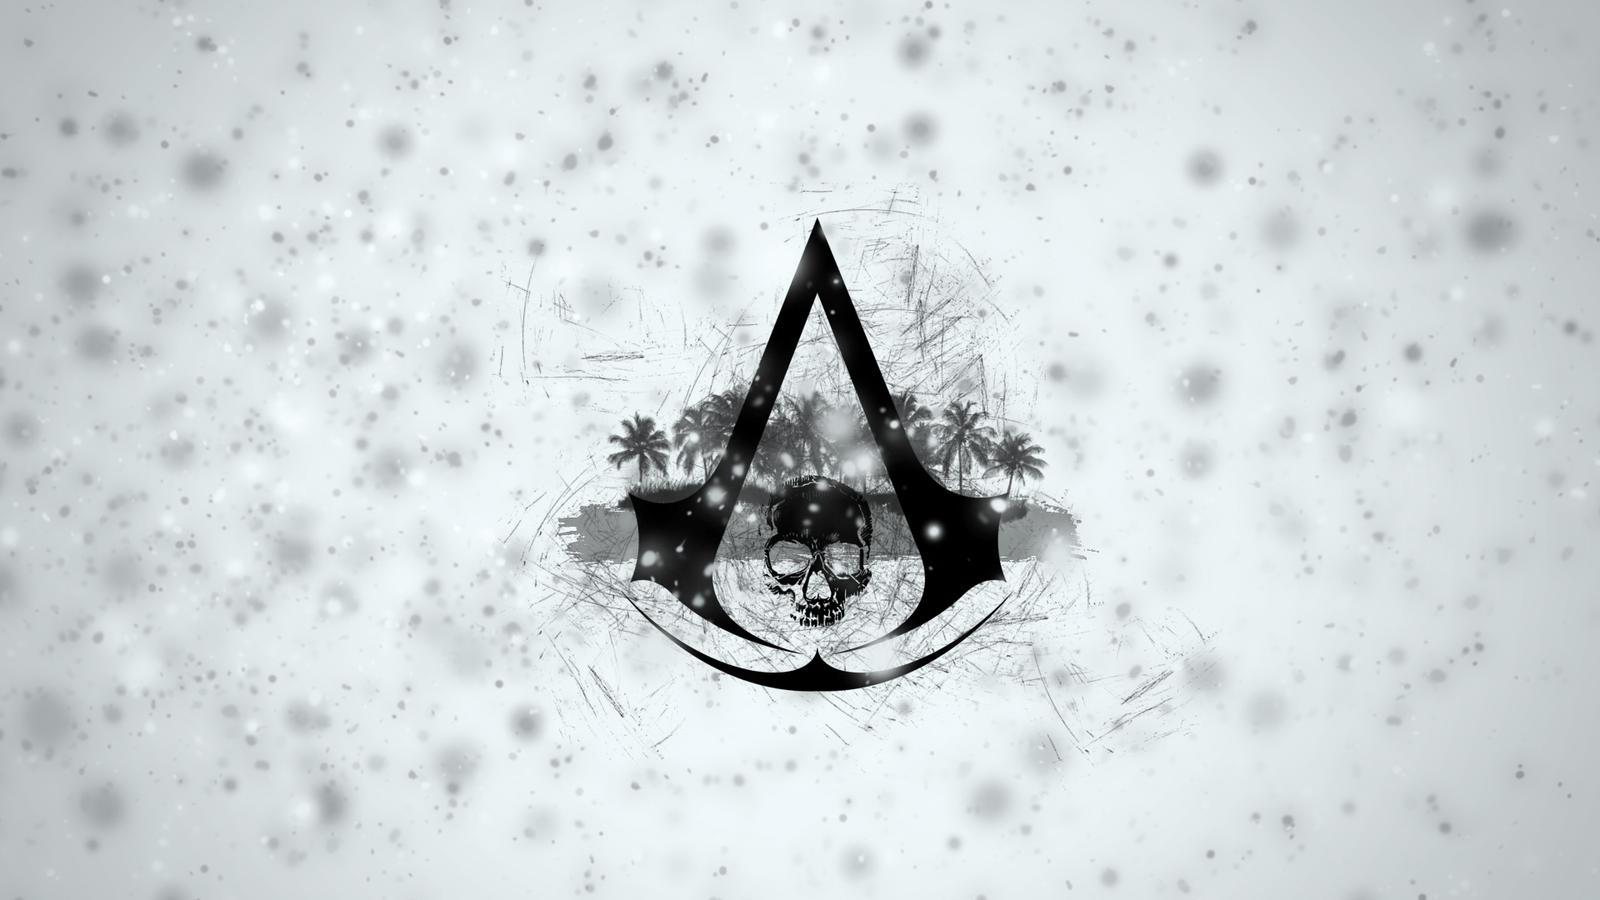 assassins creed 4 black flag logo wallpaper by binarymap